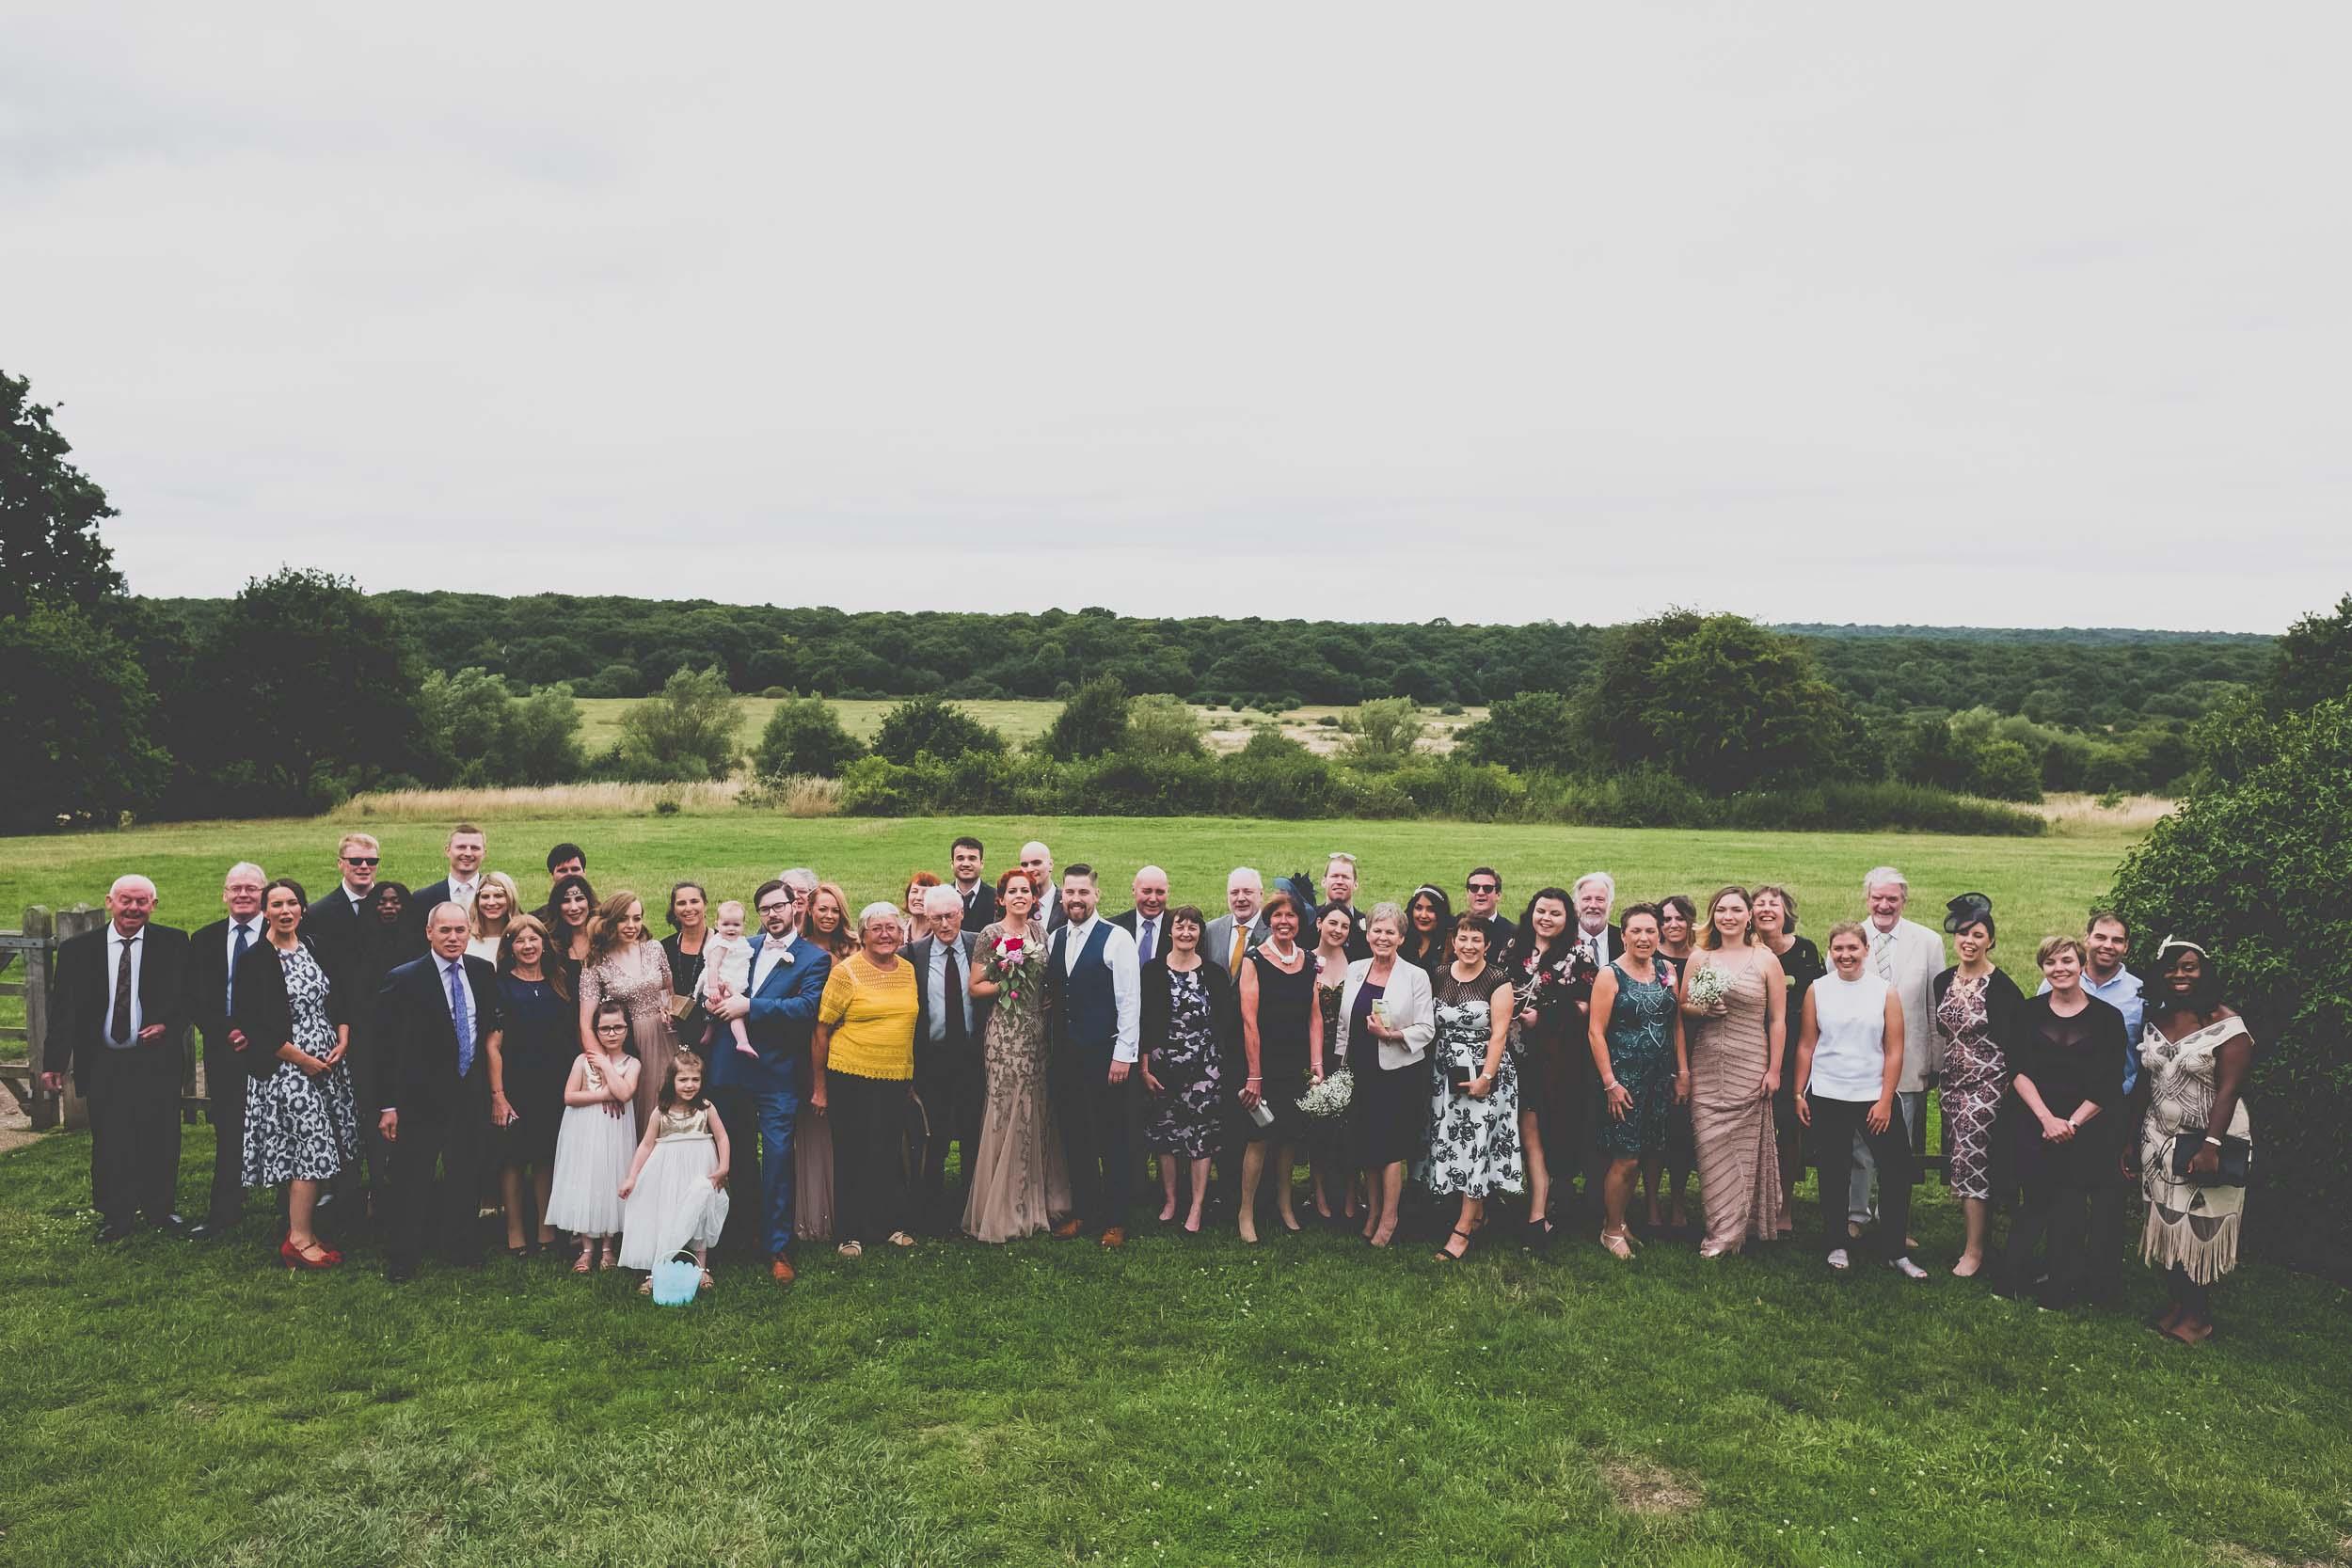 queen-elizabeths-hunting-lodge-epping-forest-wedding233.jpg